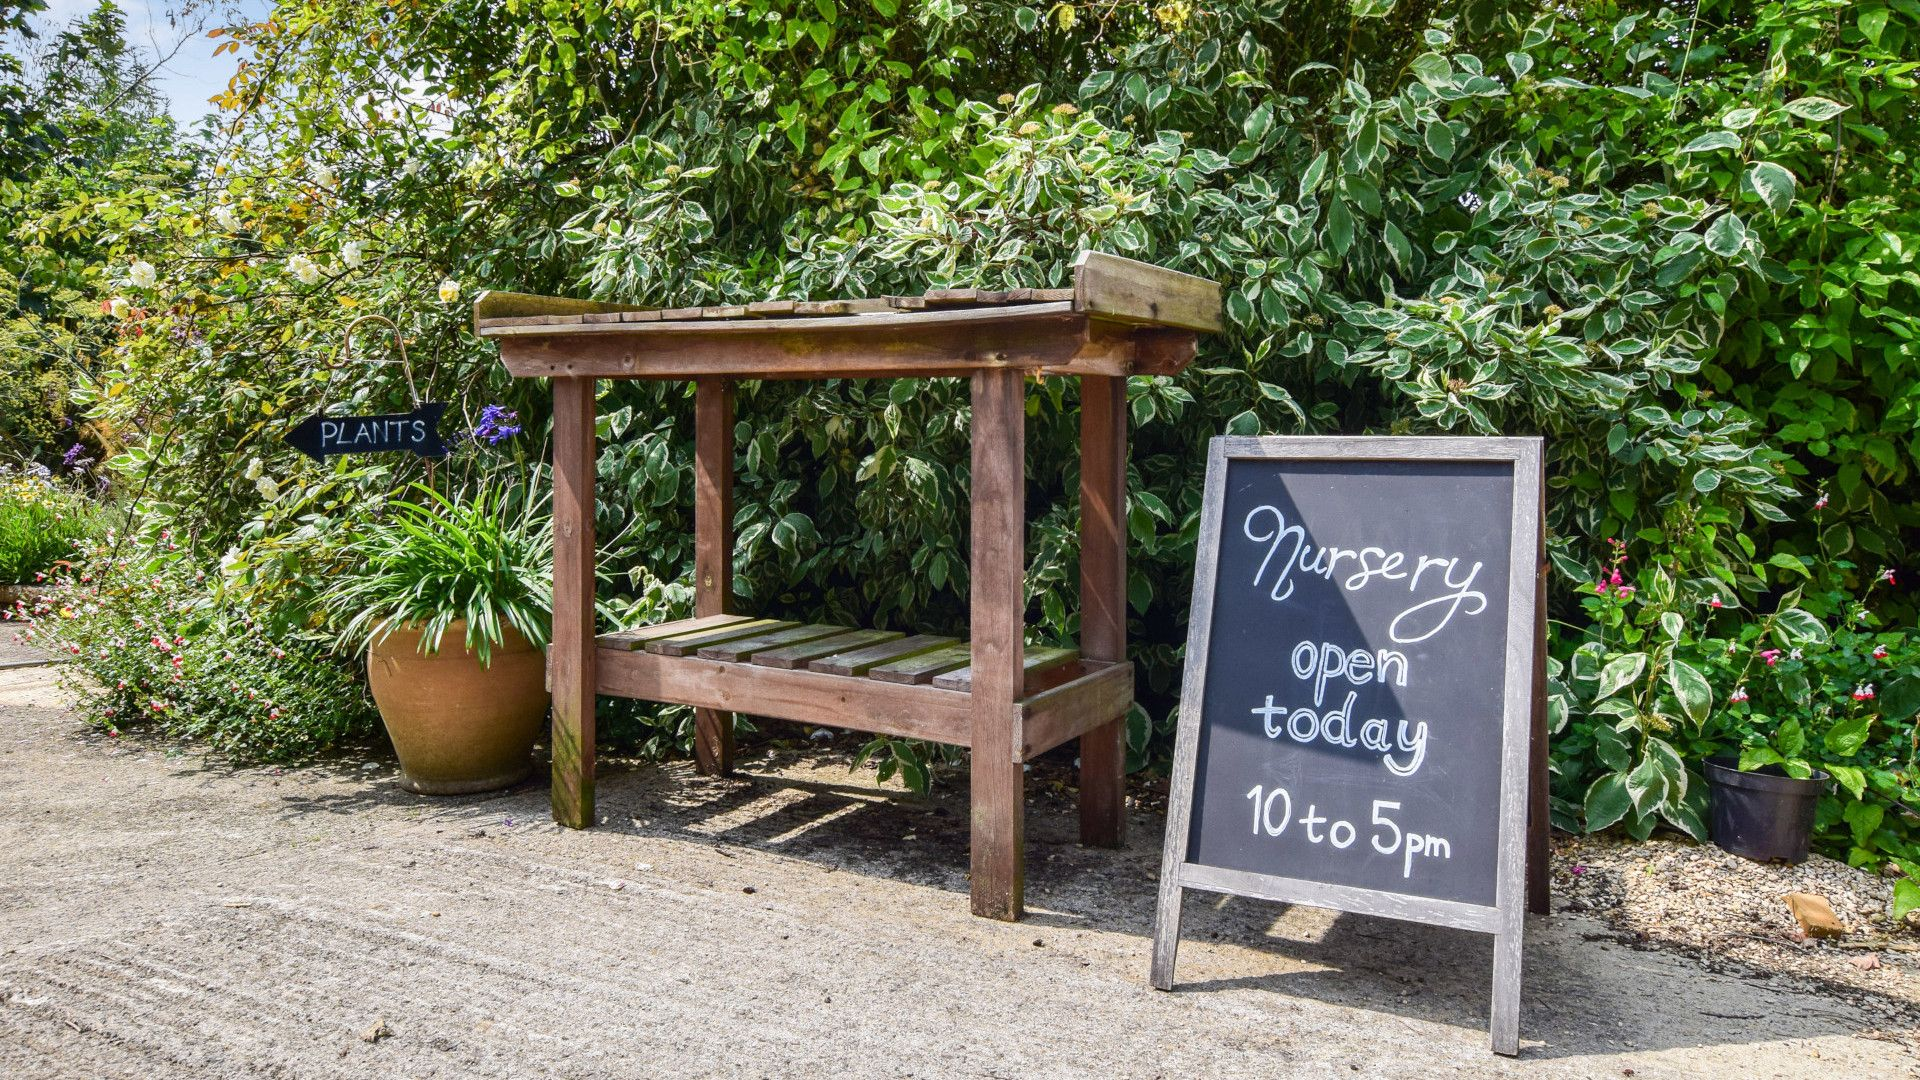 Walled Garden Nursery, Hayloft at Walnut Farm, Bolthole Retreats